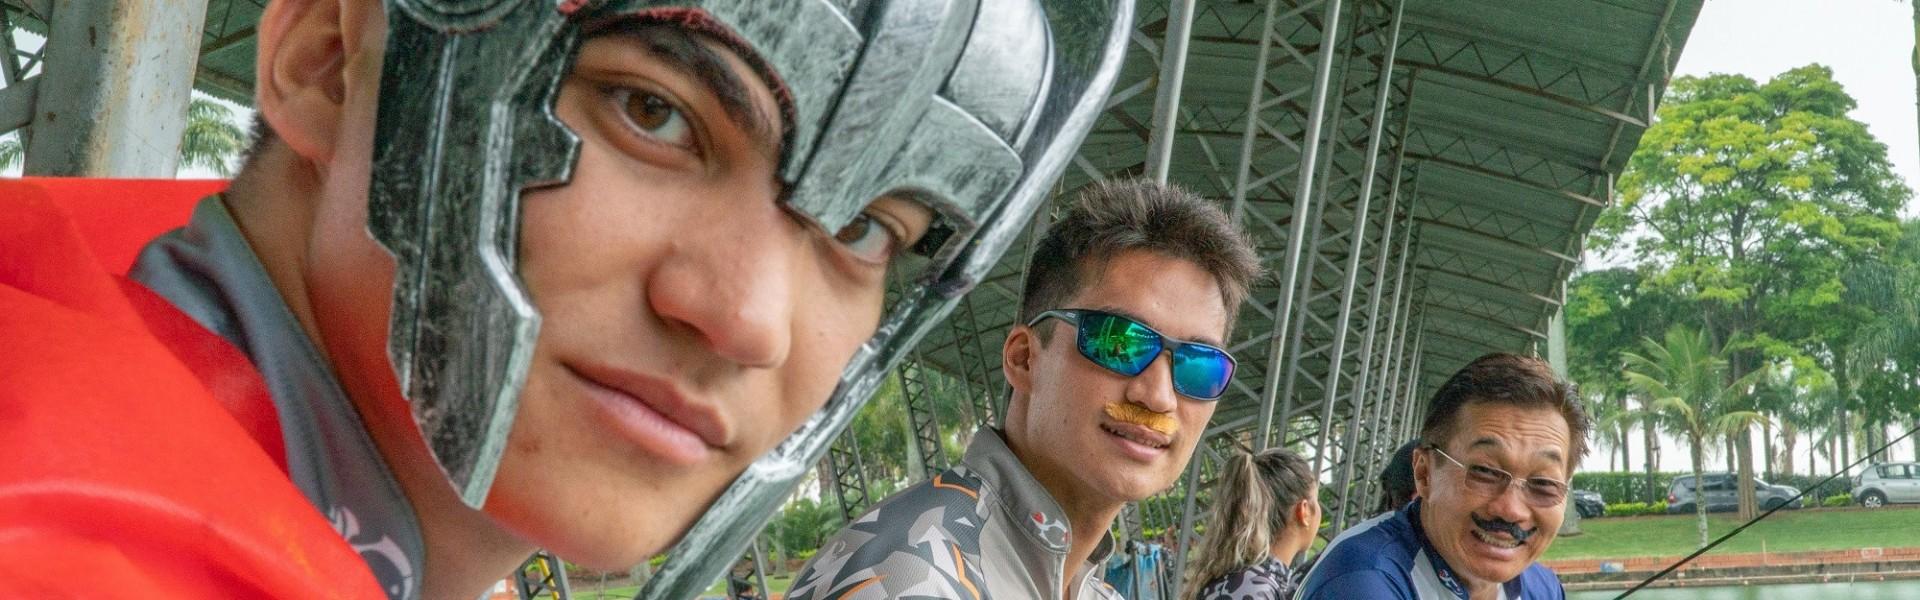 Família Nakamura, pesca esportiva